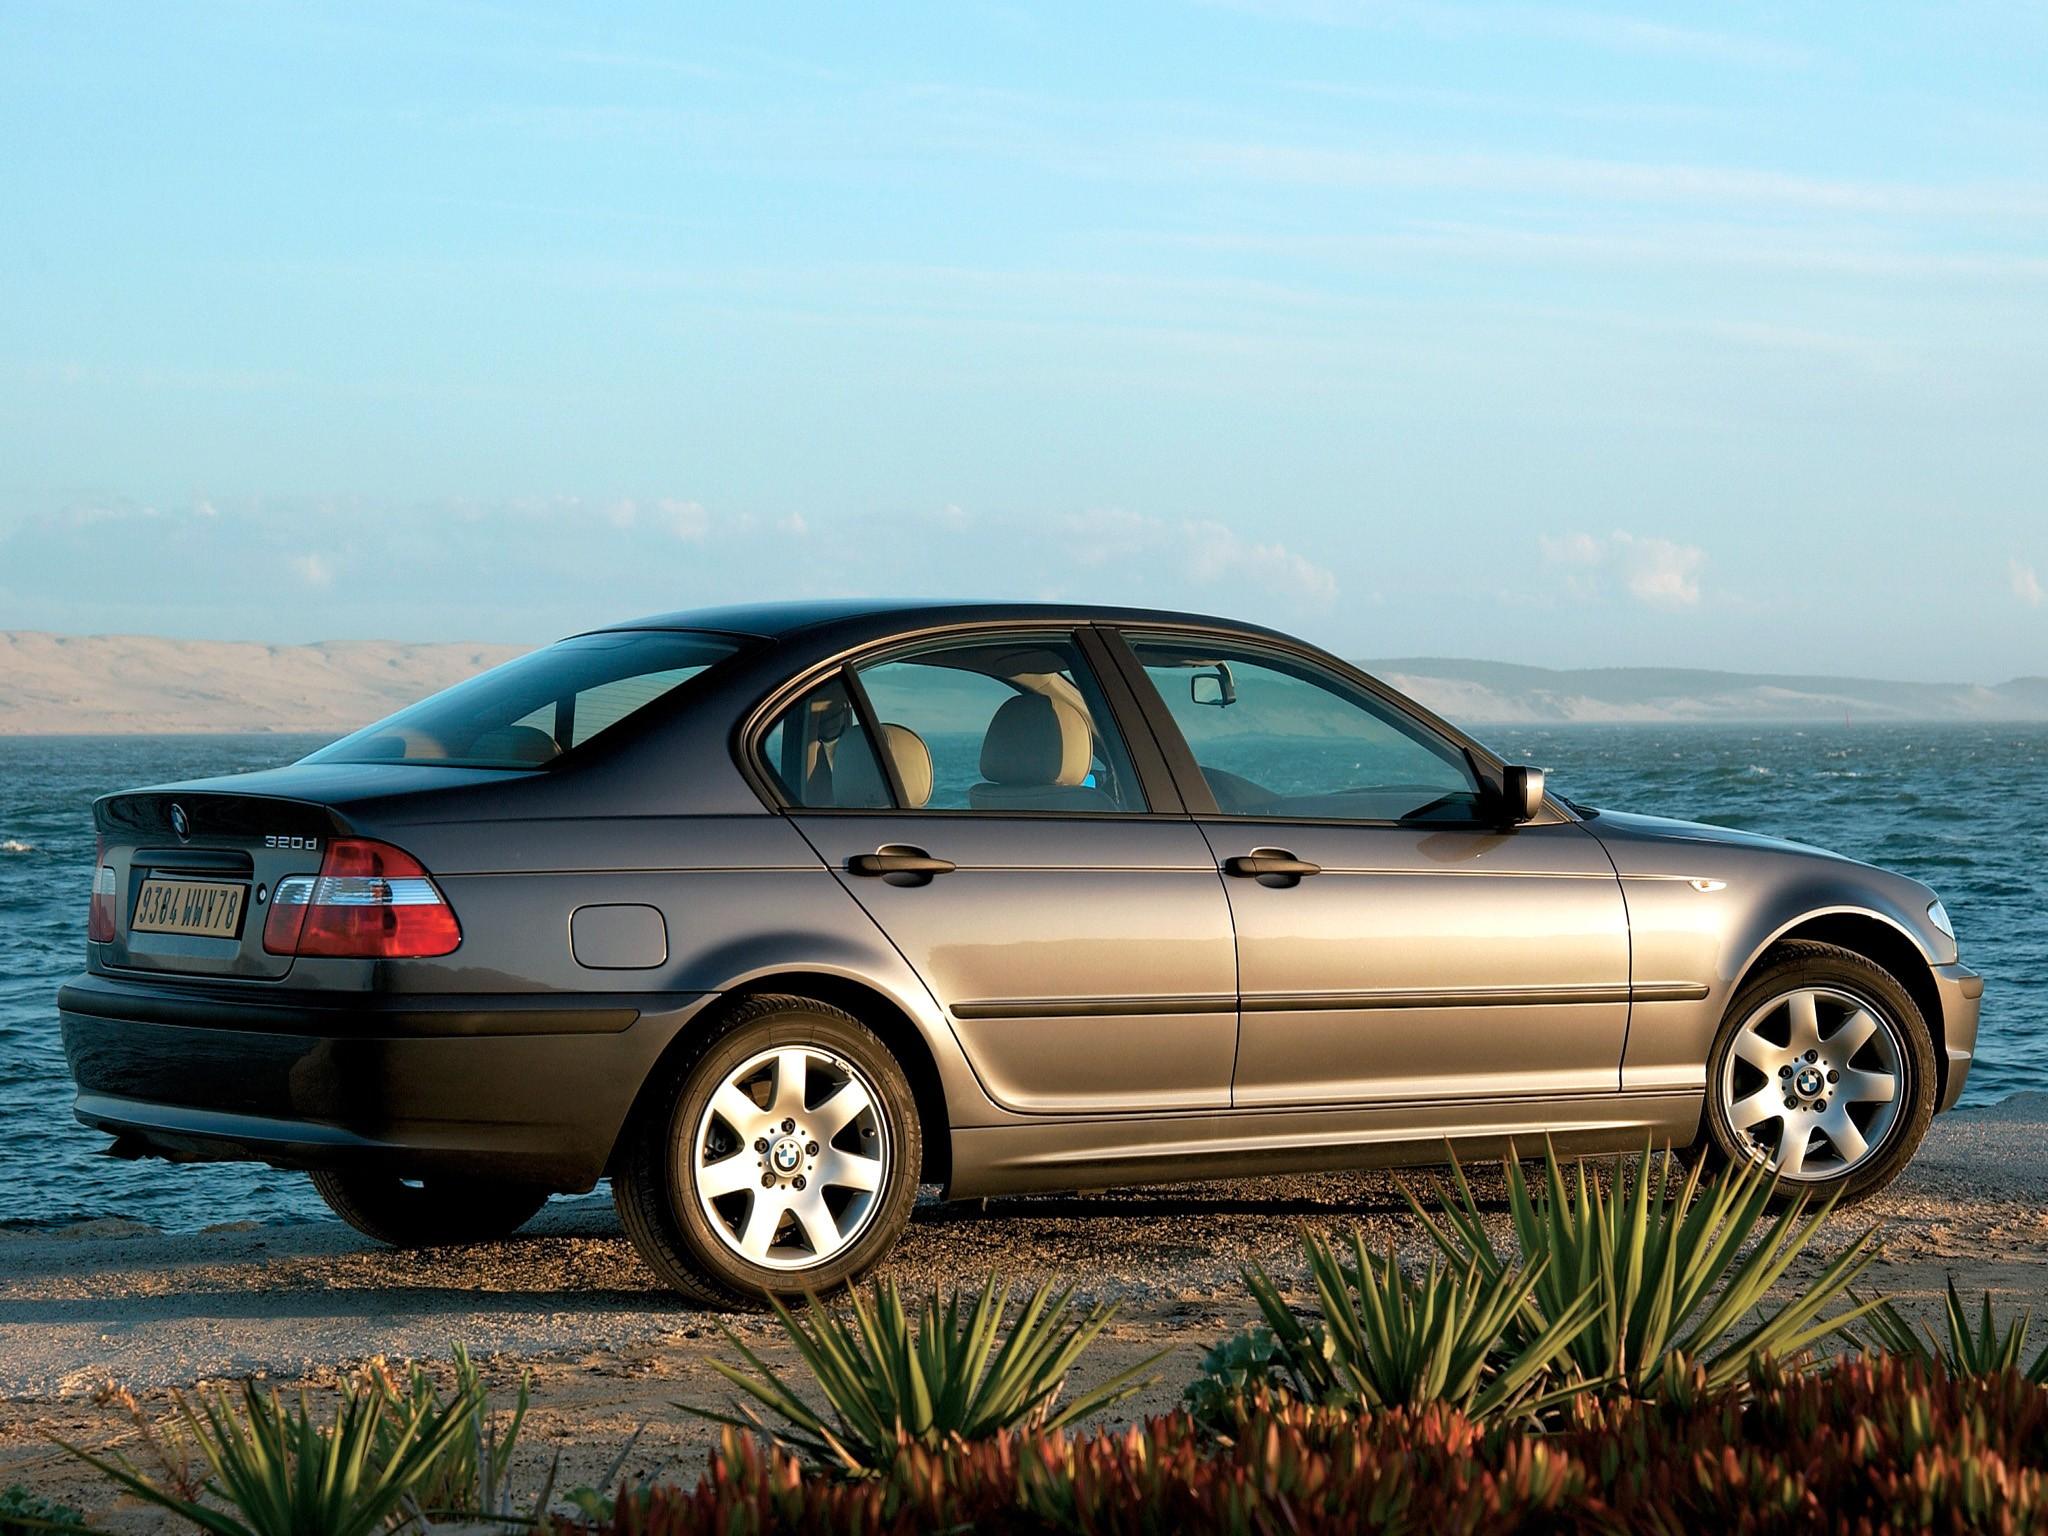 bmw e46 2005 320d series sedan 2001 2002 2048 1536 autoevolution mad4wheels 2004 2003 cars